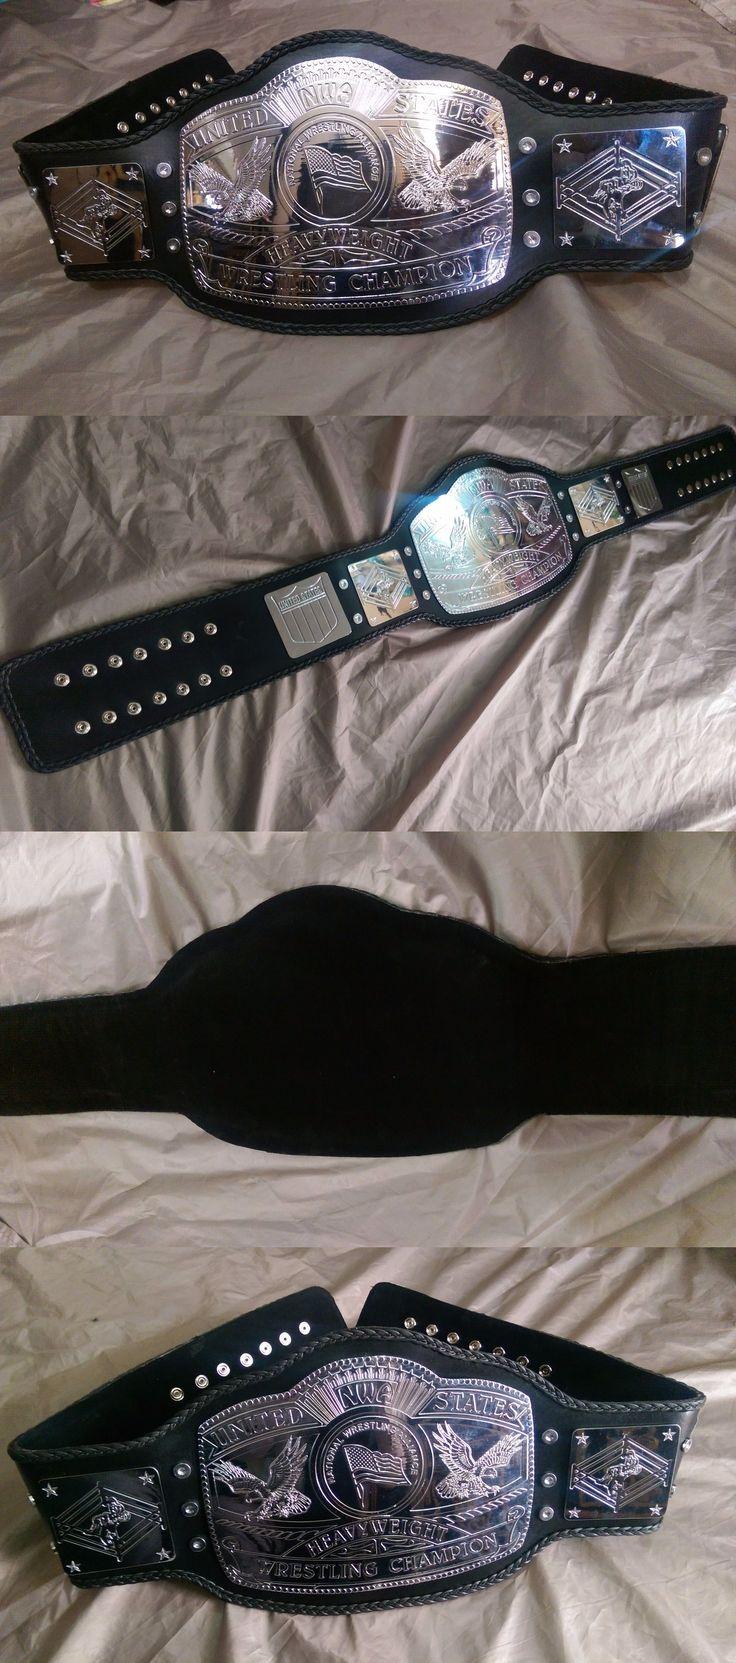 Wrestling 2902: Nwa United States Championship Belt Unpainted -> BUY IT NOW ONLY: $225 on eBay!